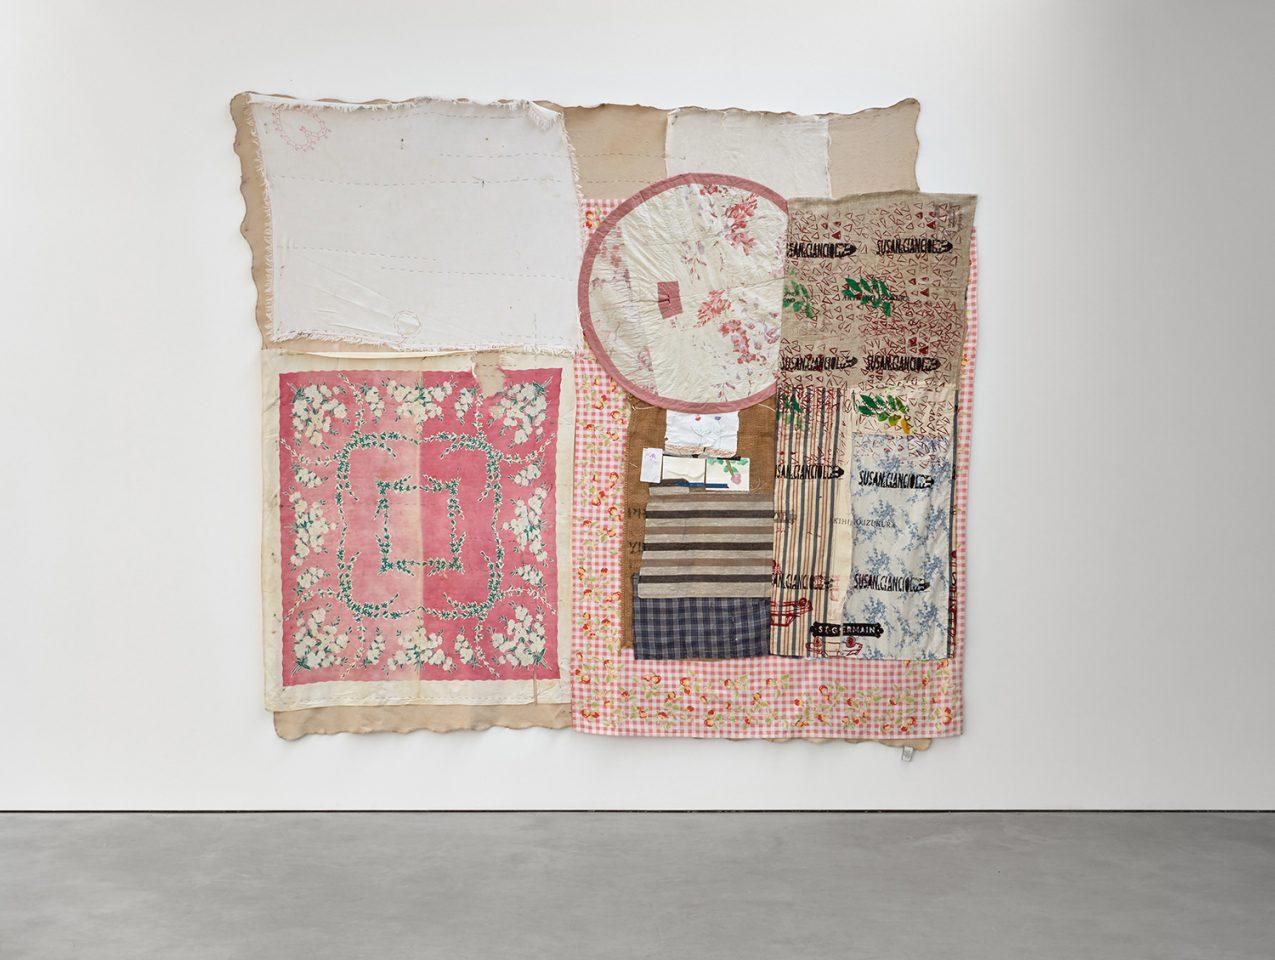 Susan Cianciolo, Tapestry 2, 2010-17.Courtesy Stuart Shave/Modern Art, London. Copyright the Artist. Photo: Robert Glowacki.